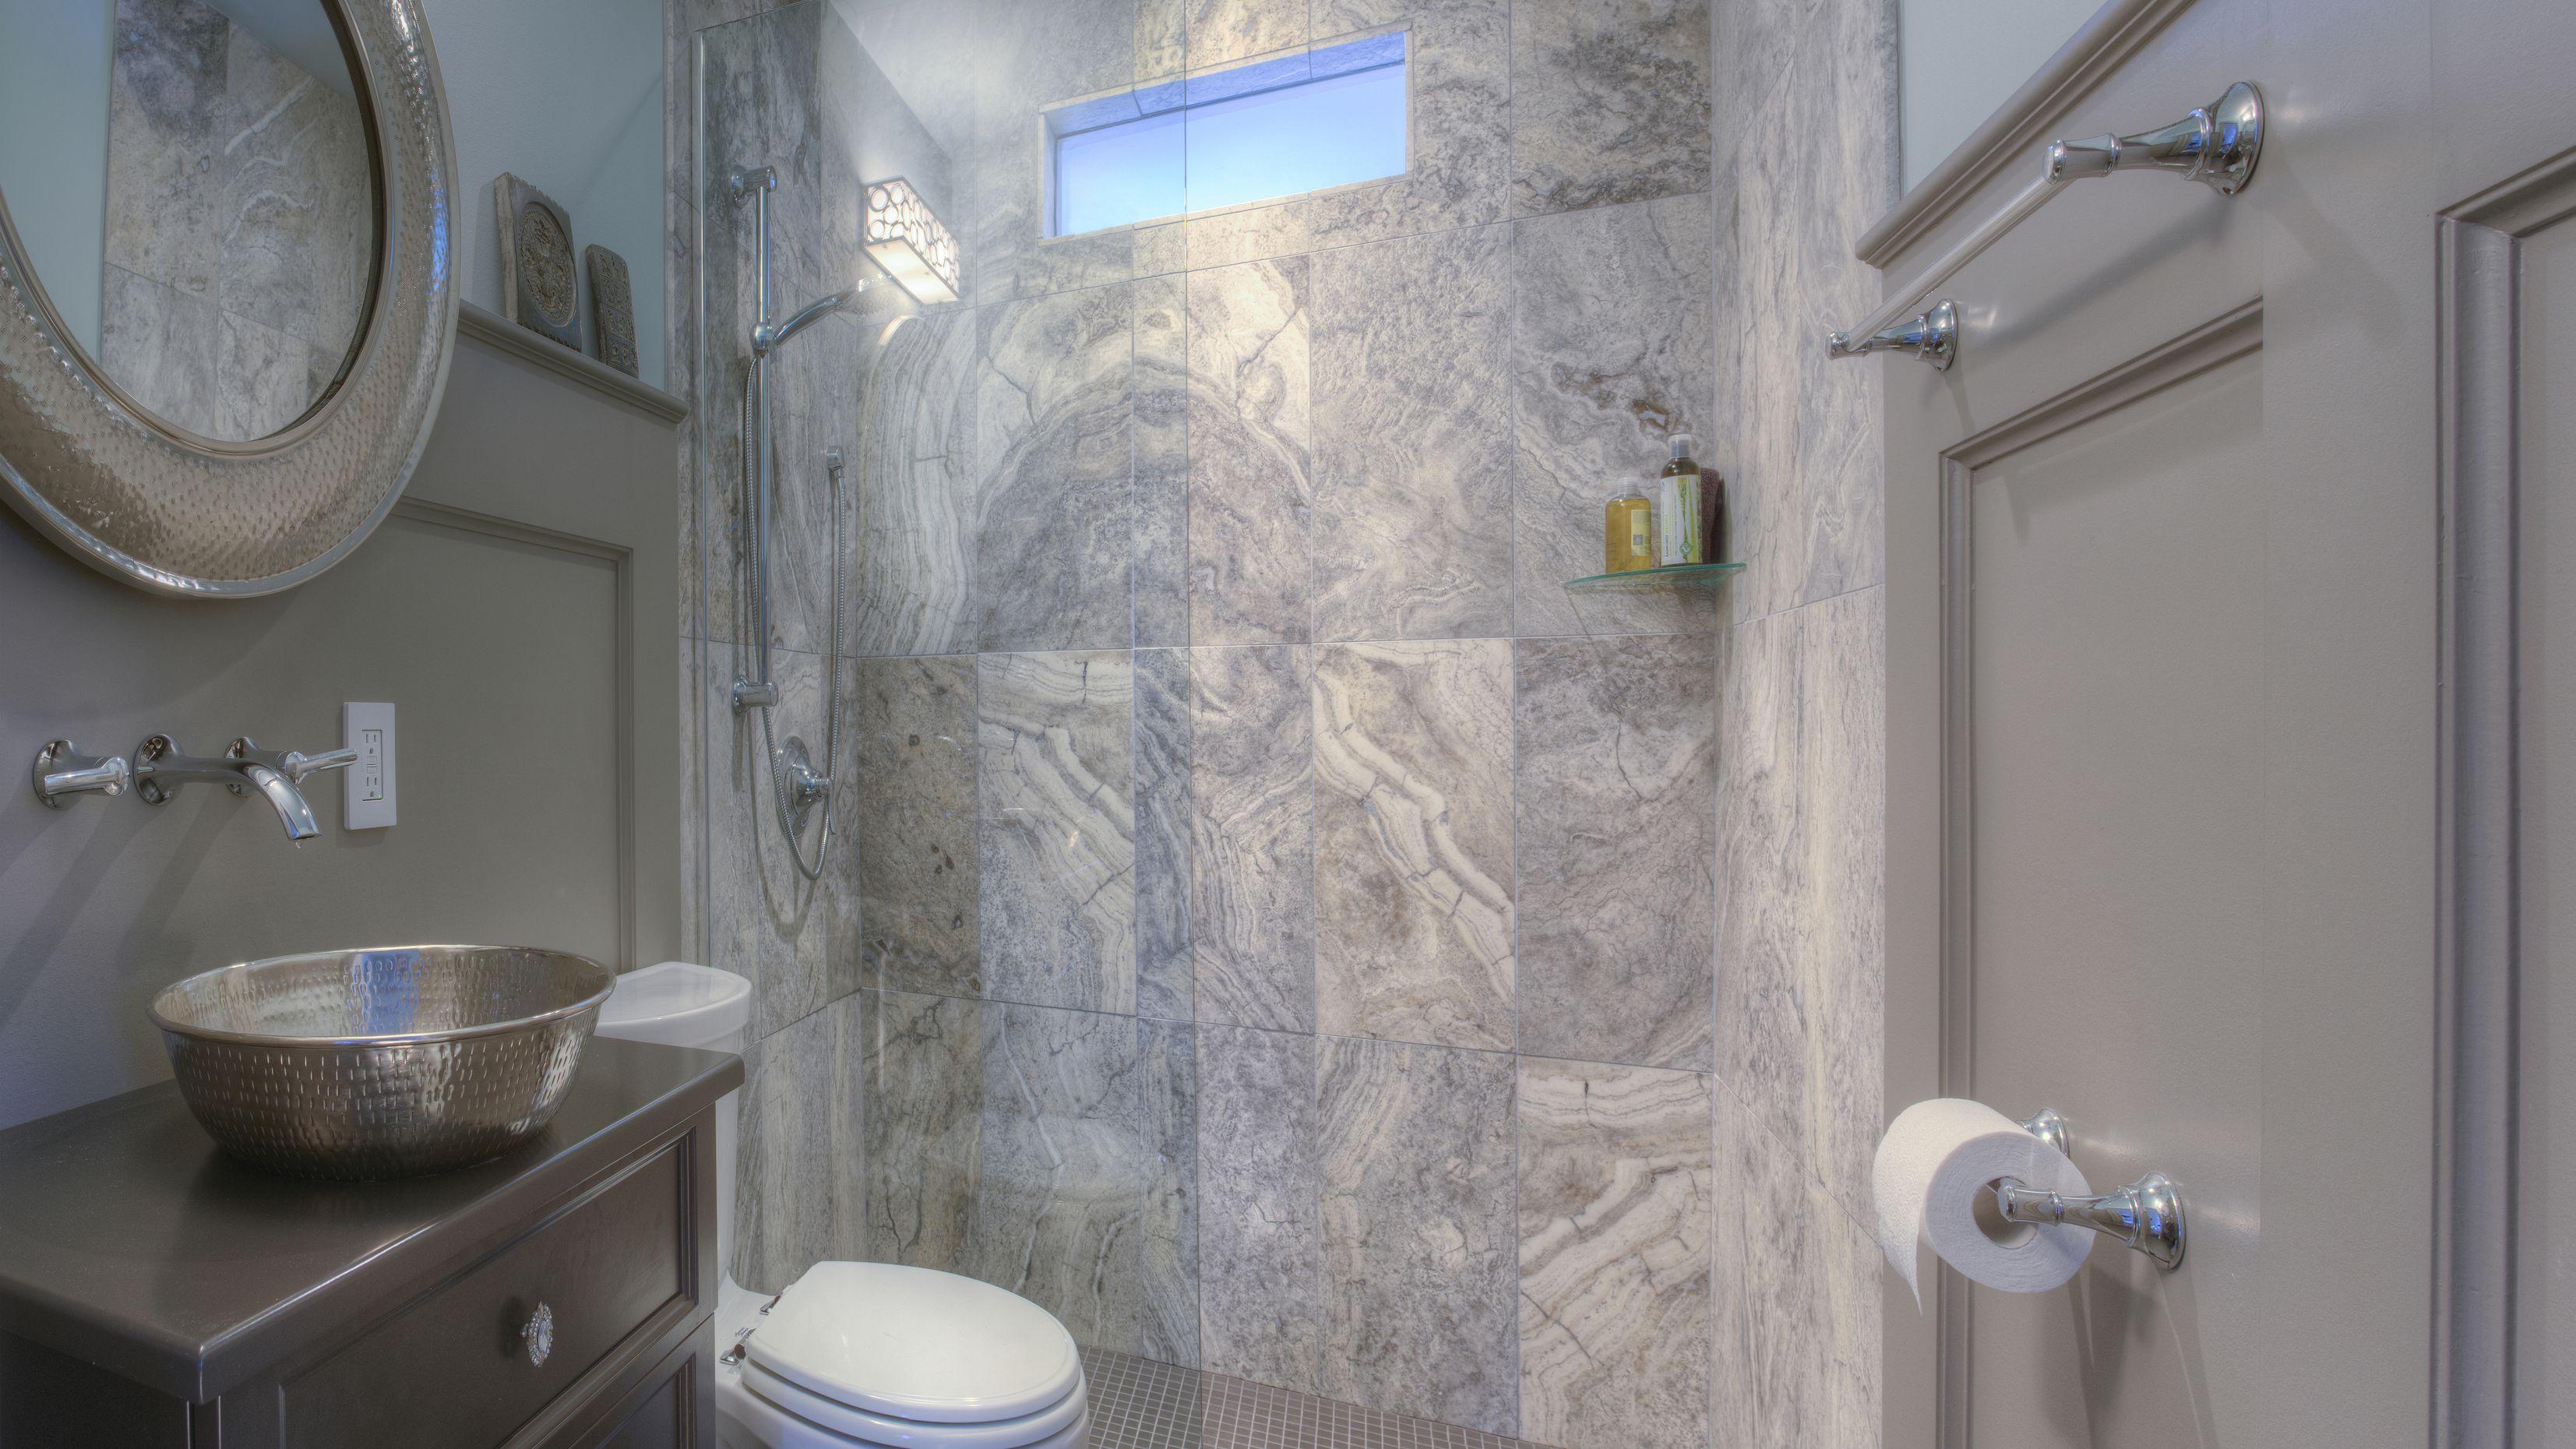 25 Professional Small Bathroom Design Tips